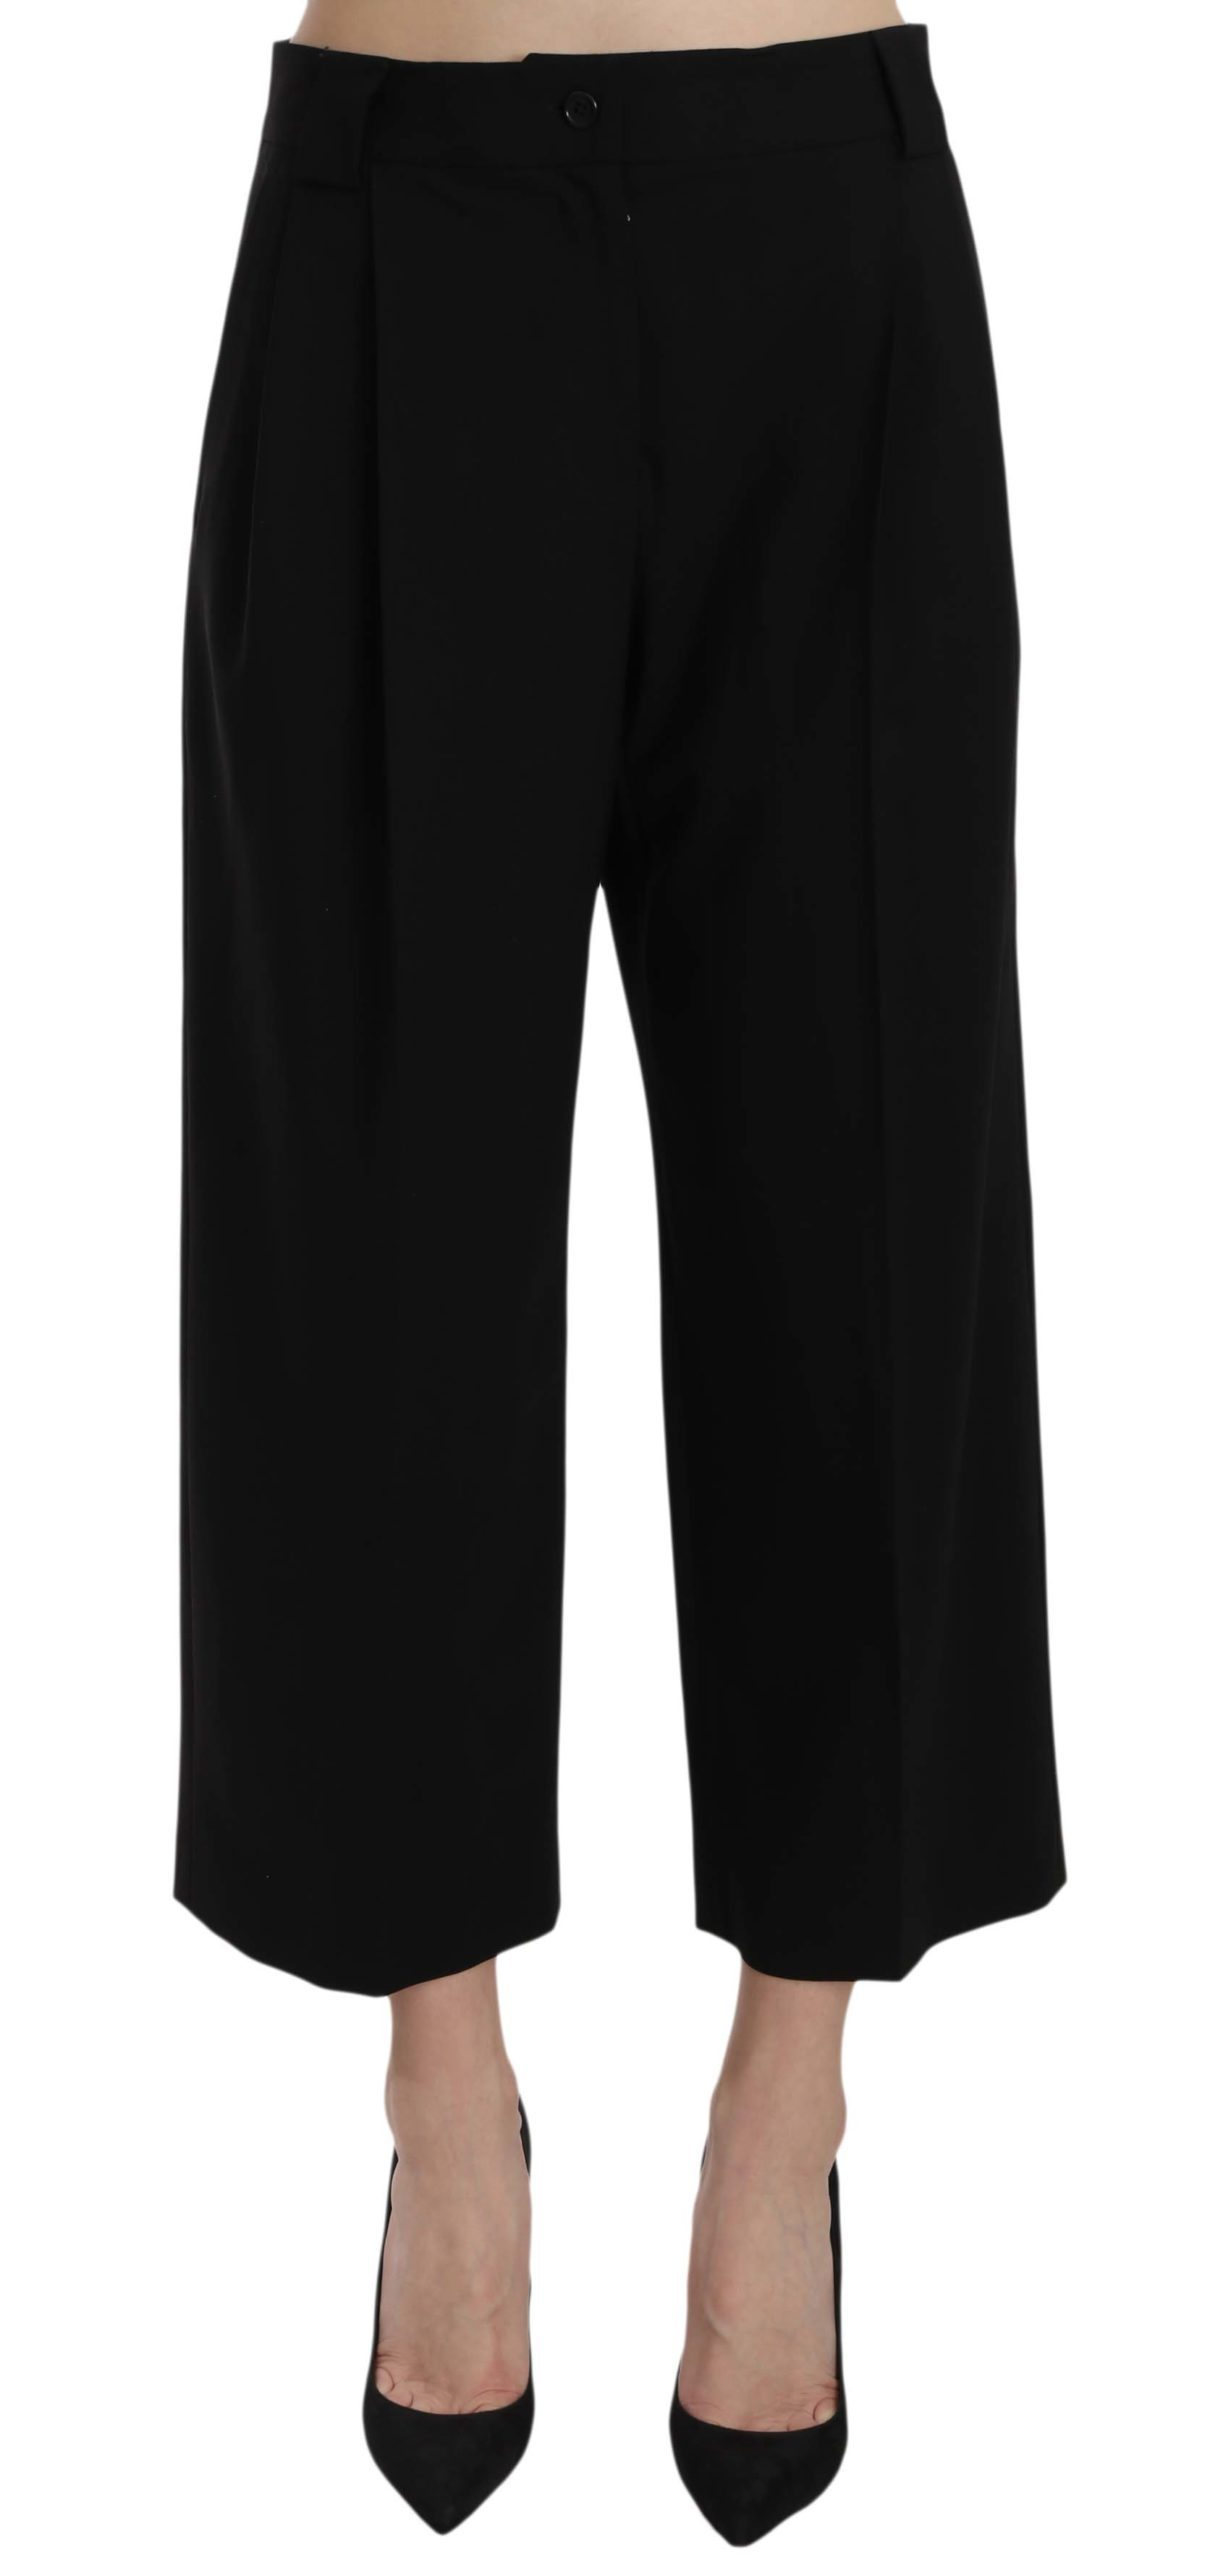 Dolce & Gabbana Women's Trouser Black PAN61197 - IT40|S